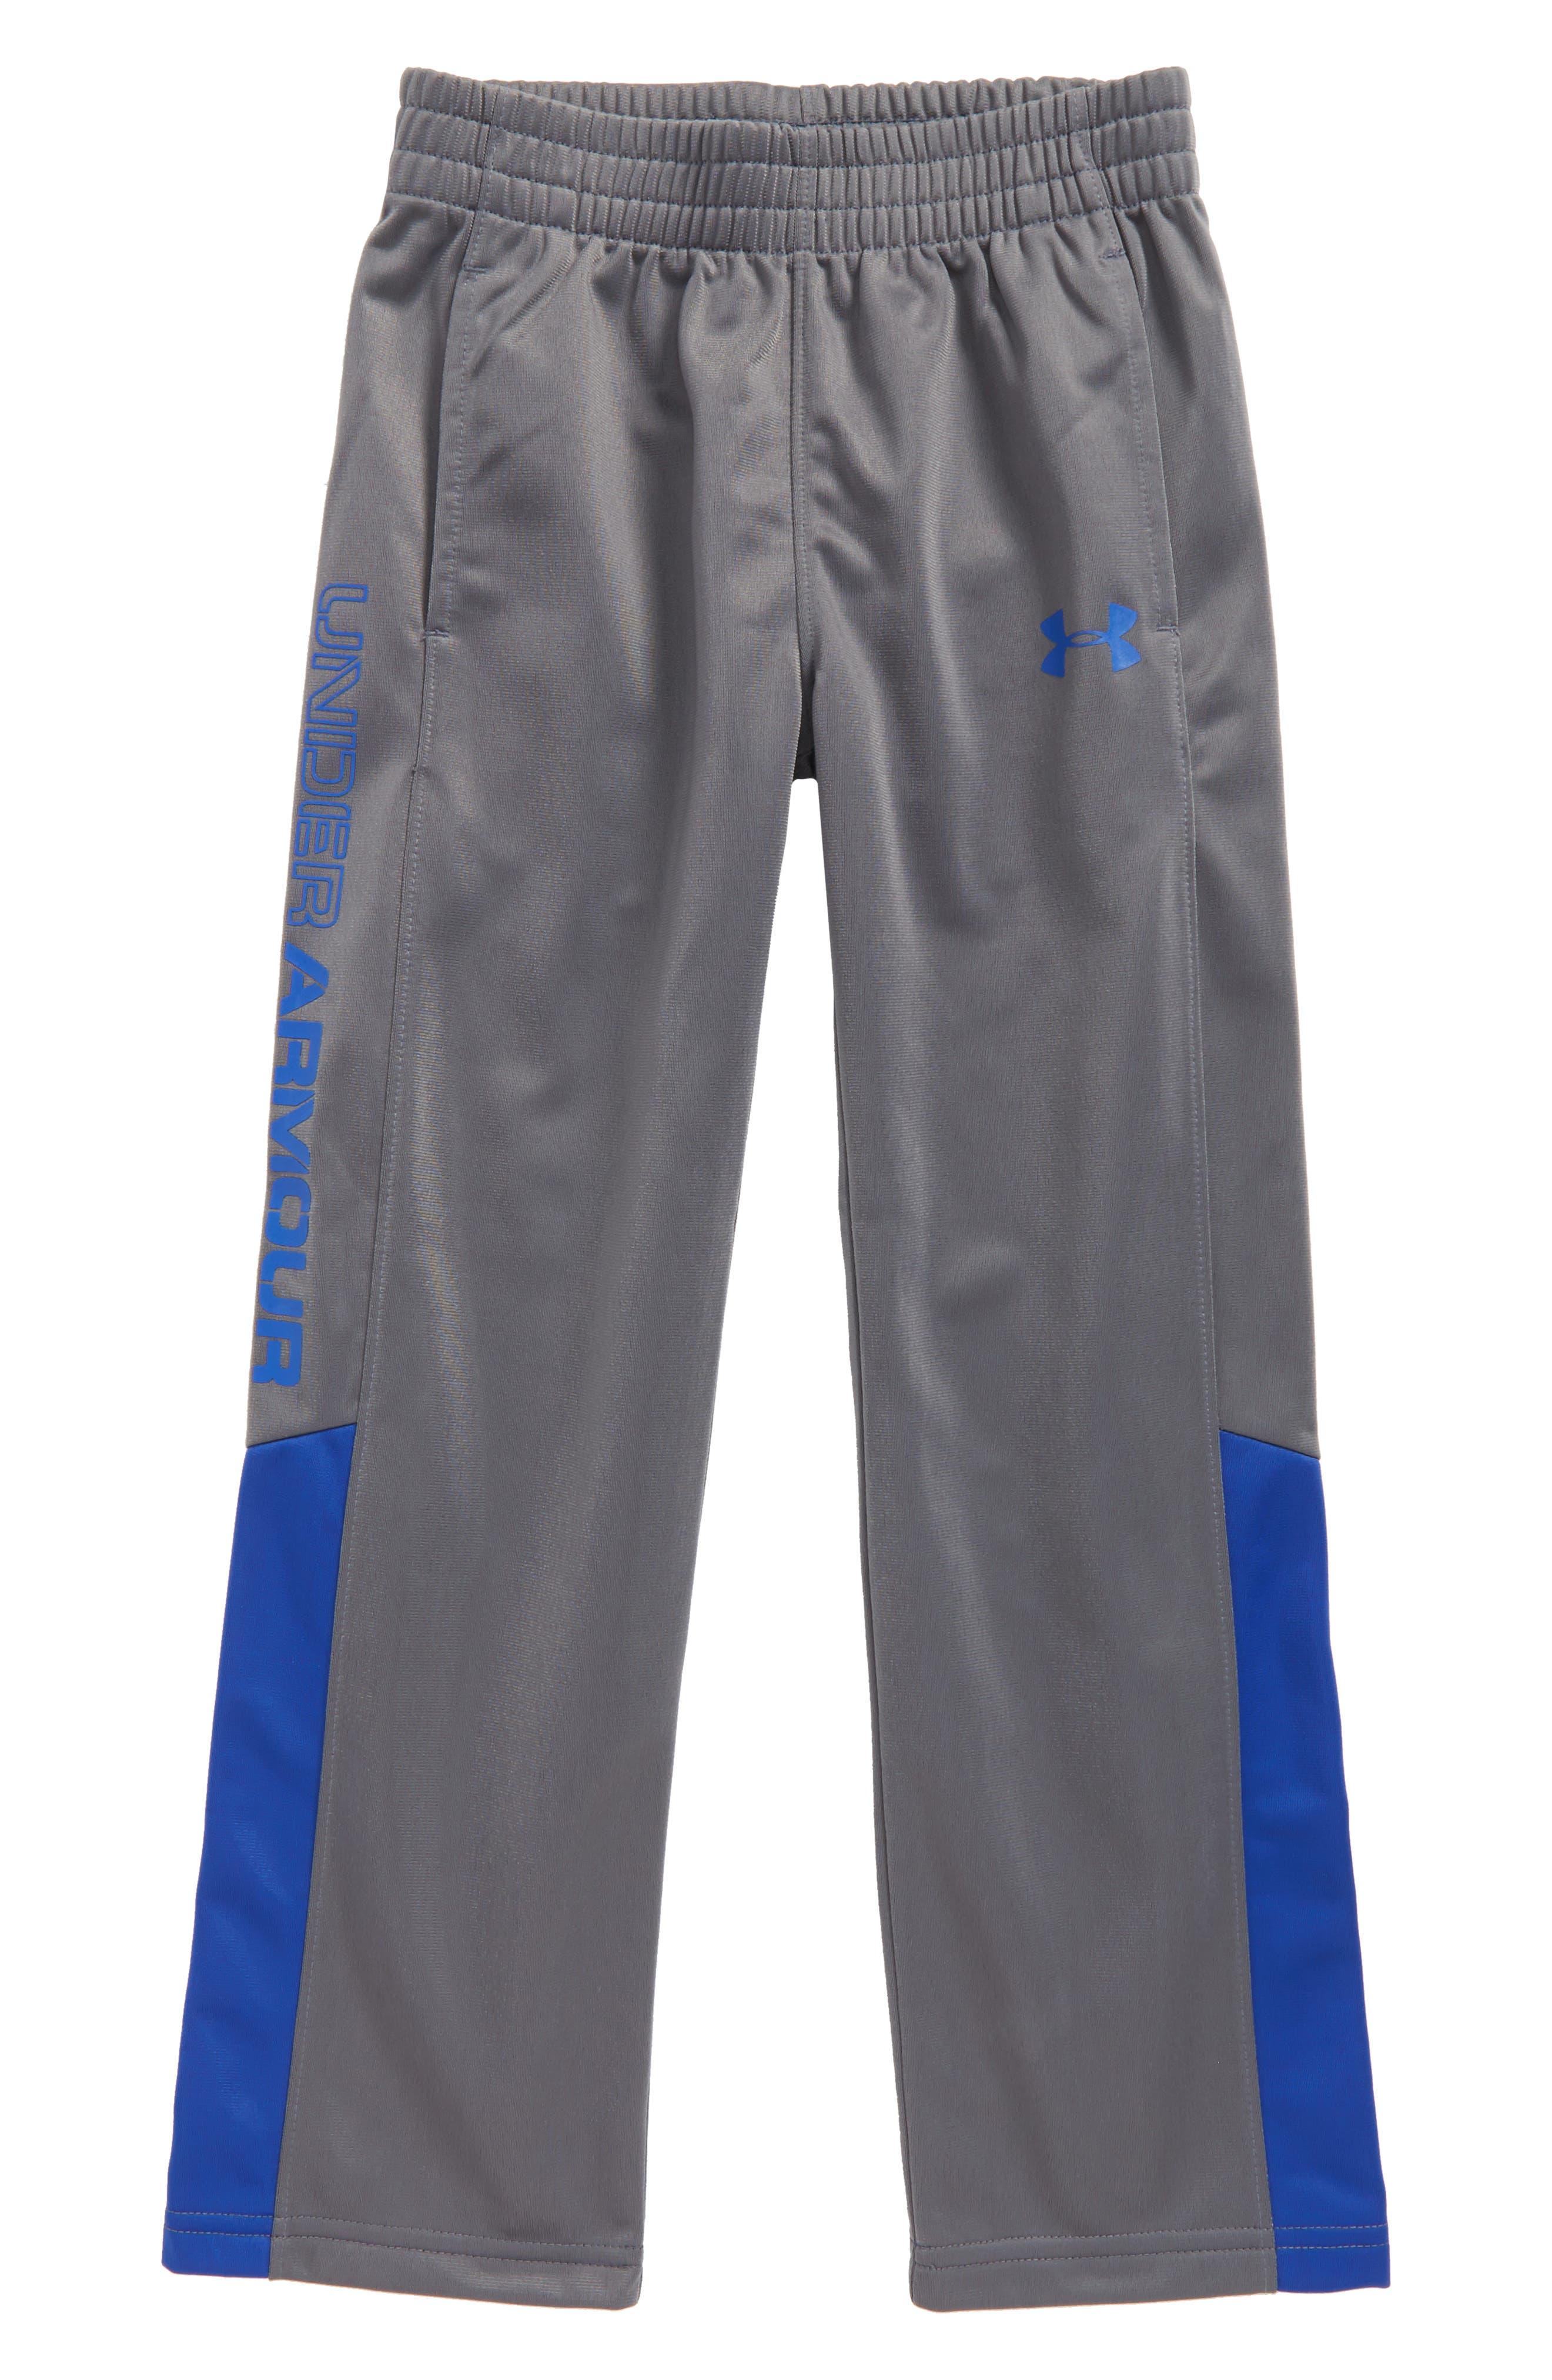 Under Armour Brawler 2.0 Pants (Toddler Boys & Little Boys)